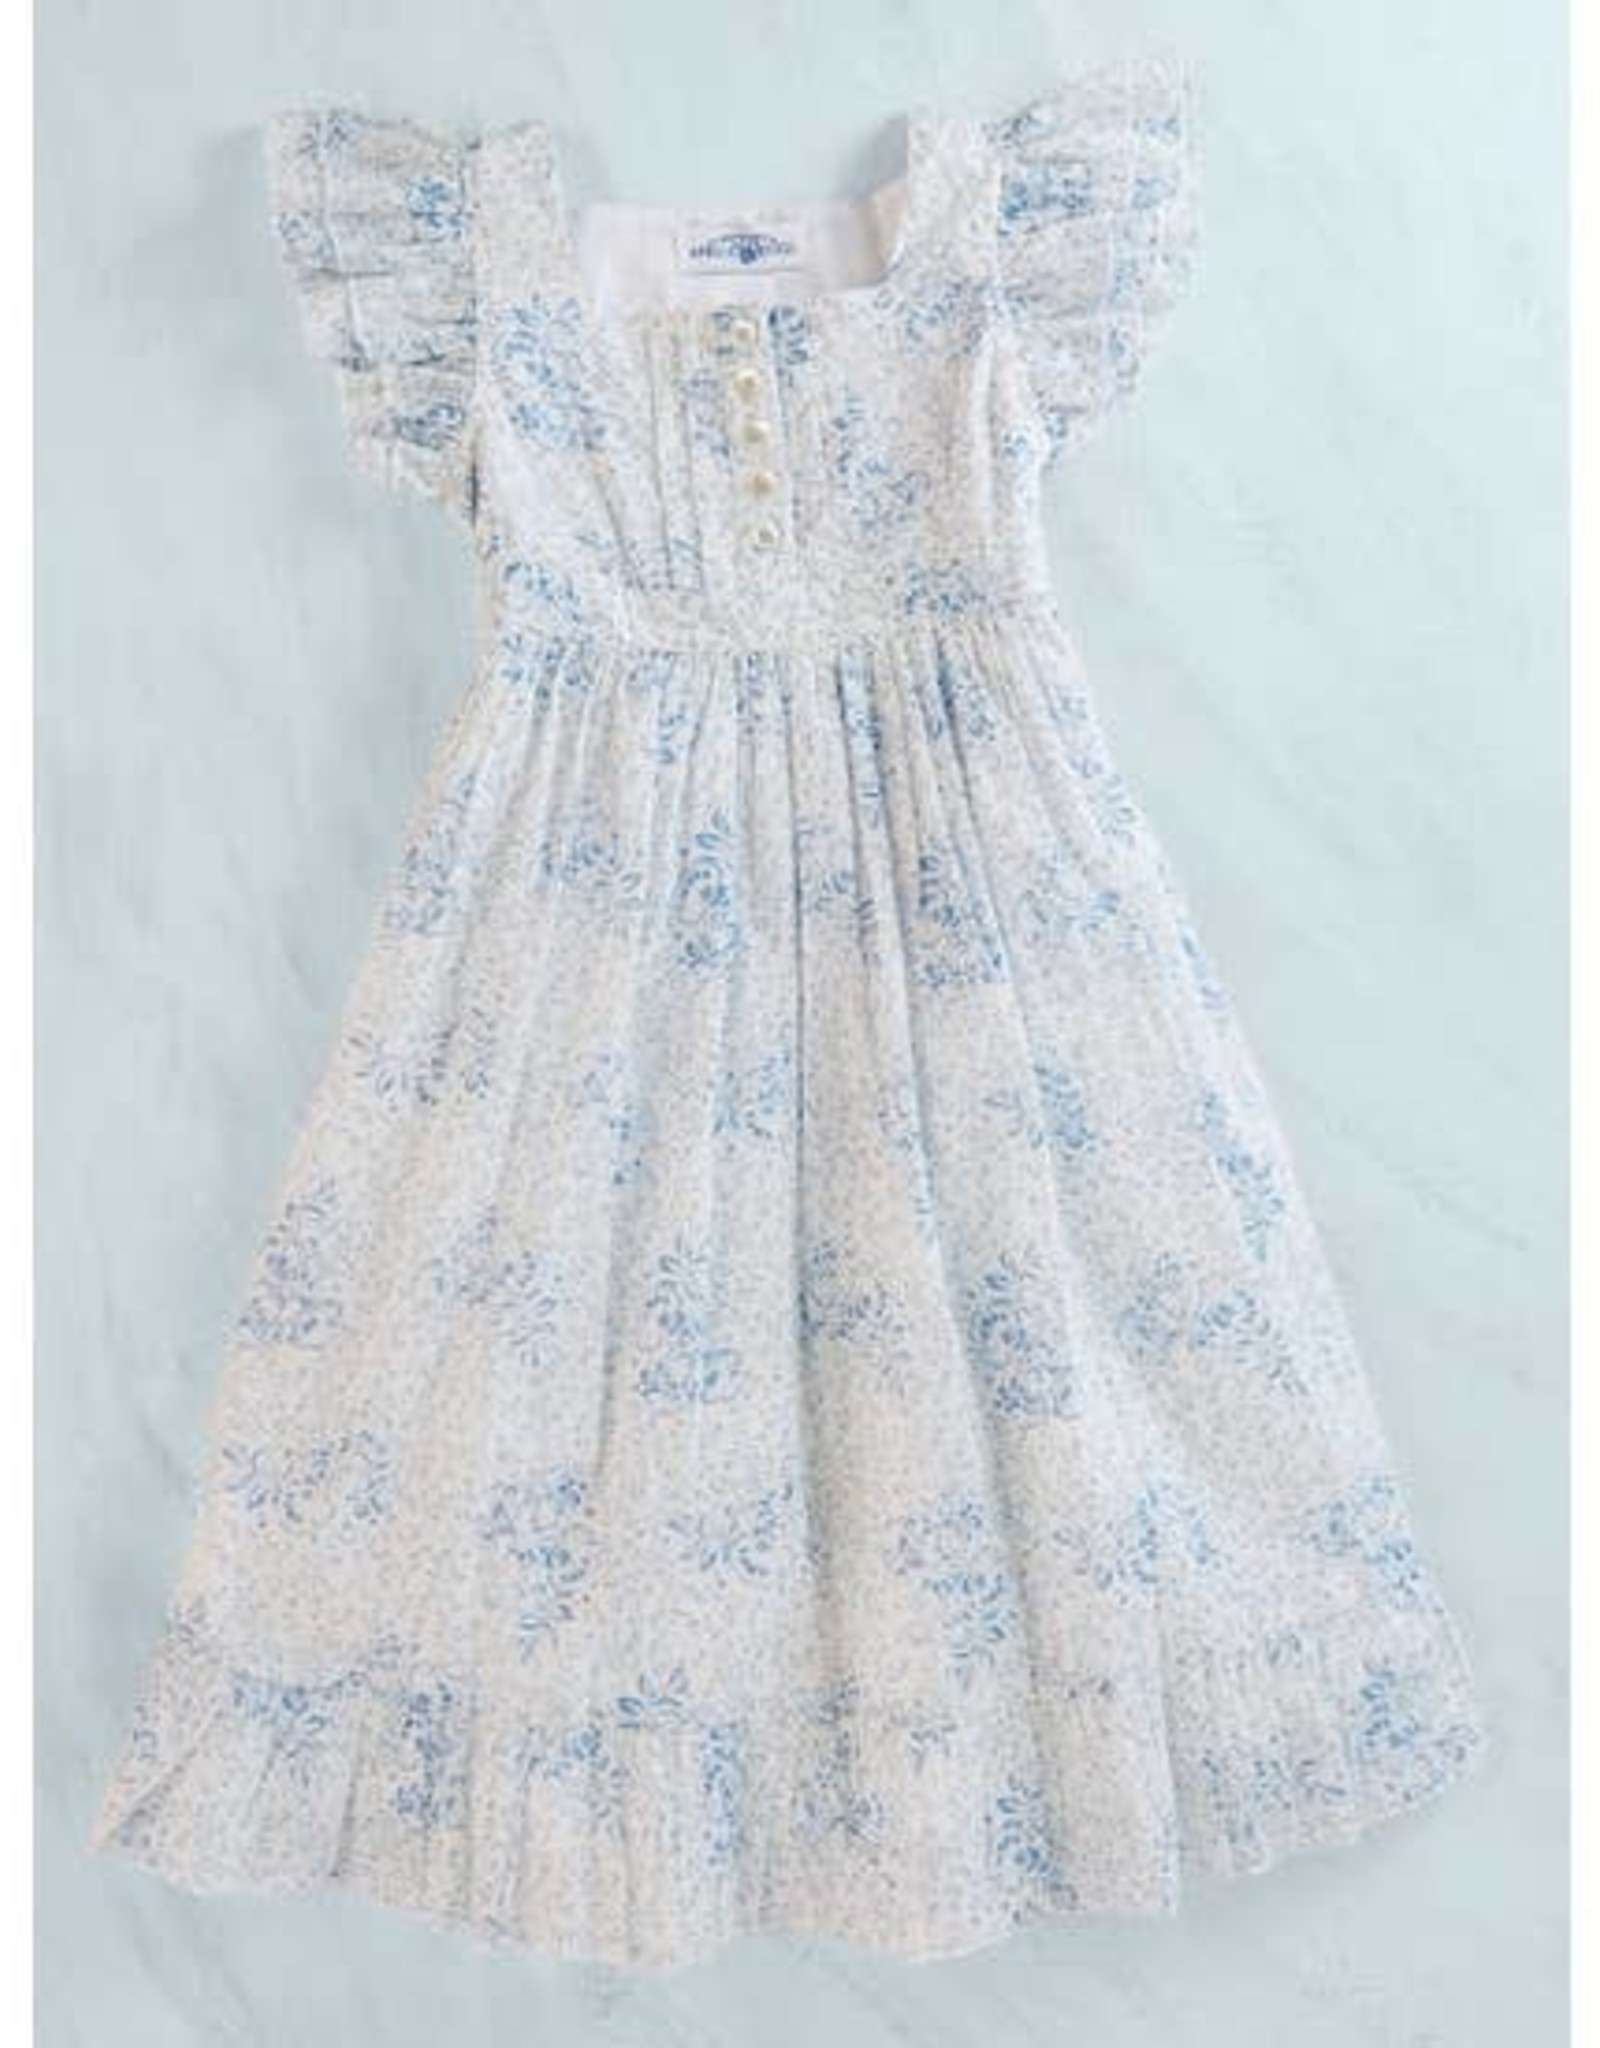 april cornell Poetry Girls Dress